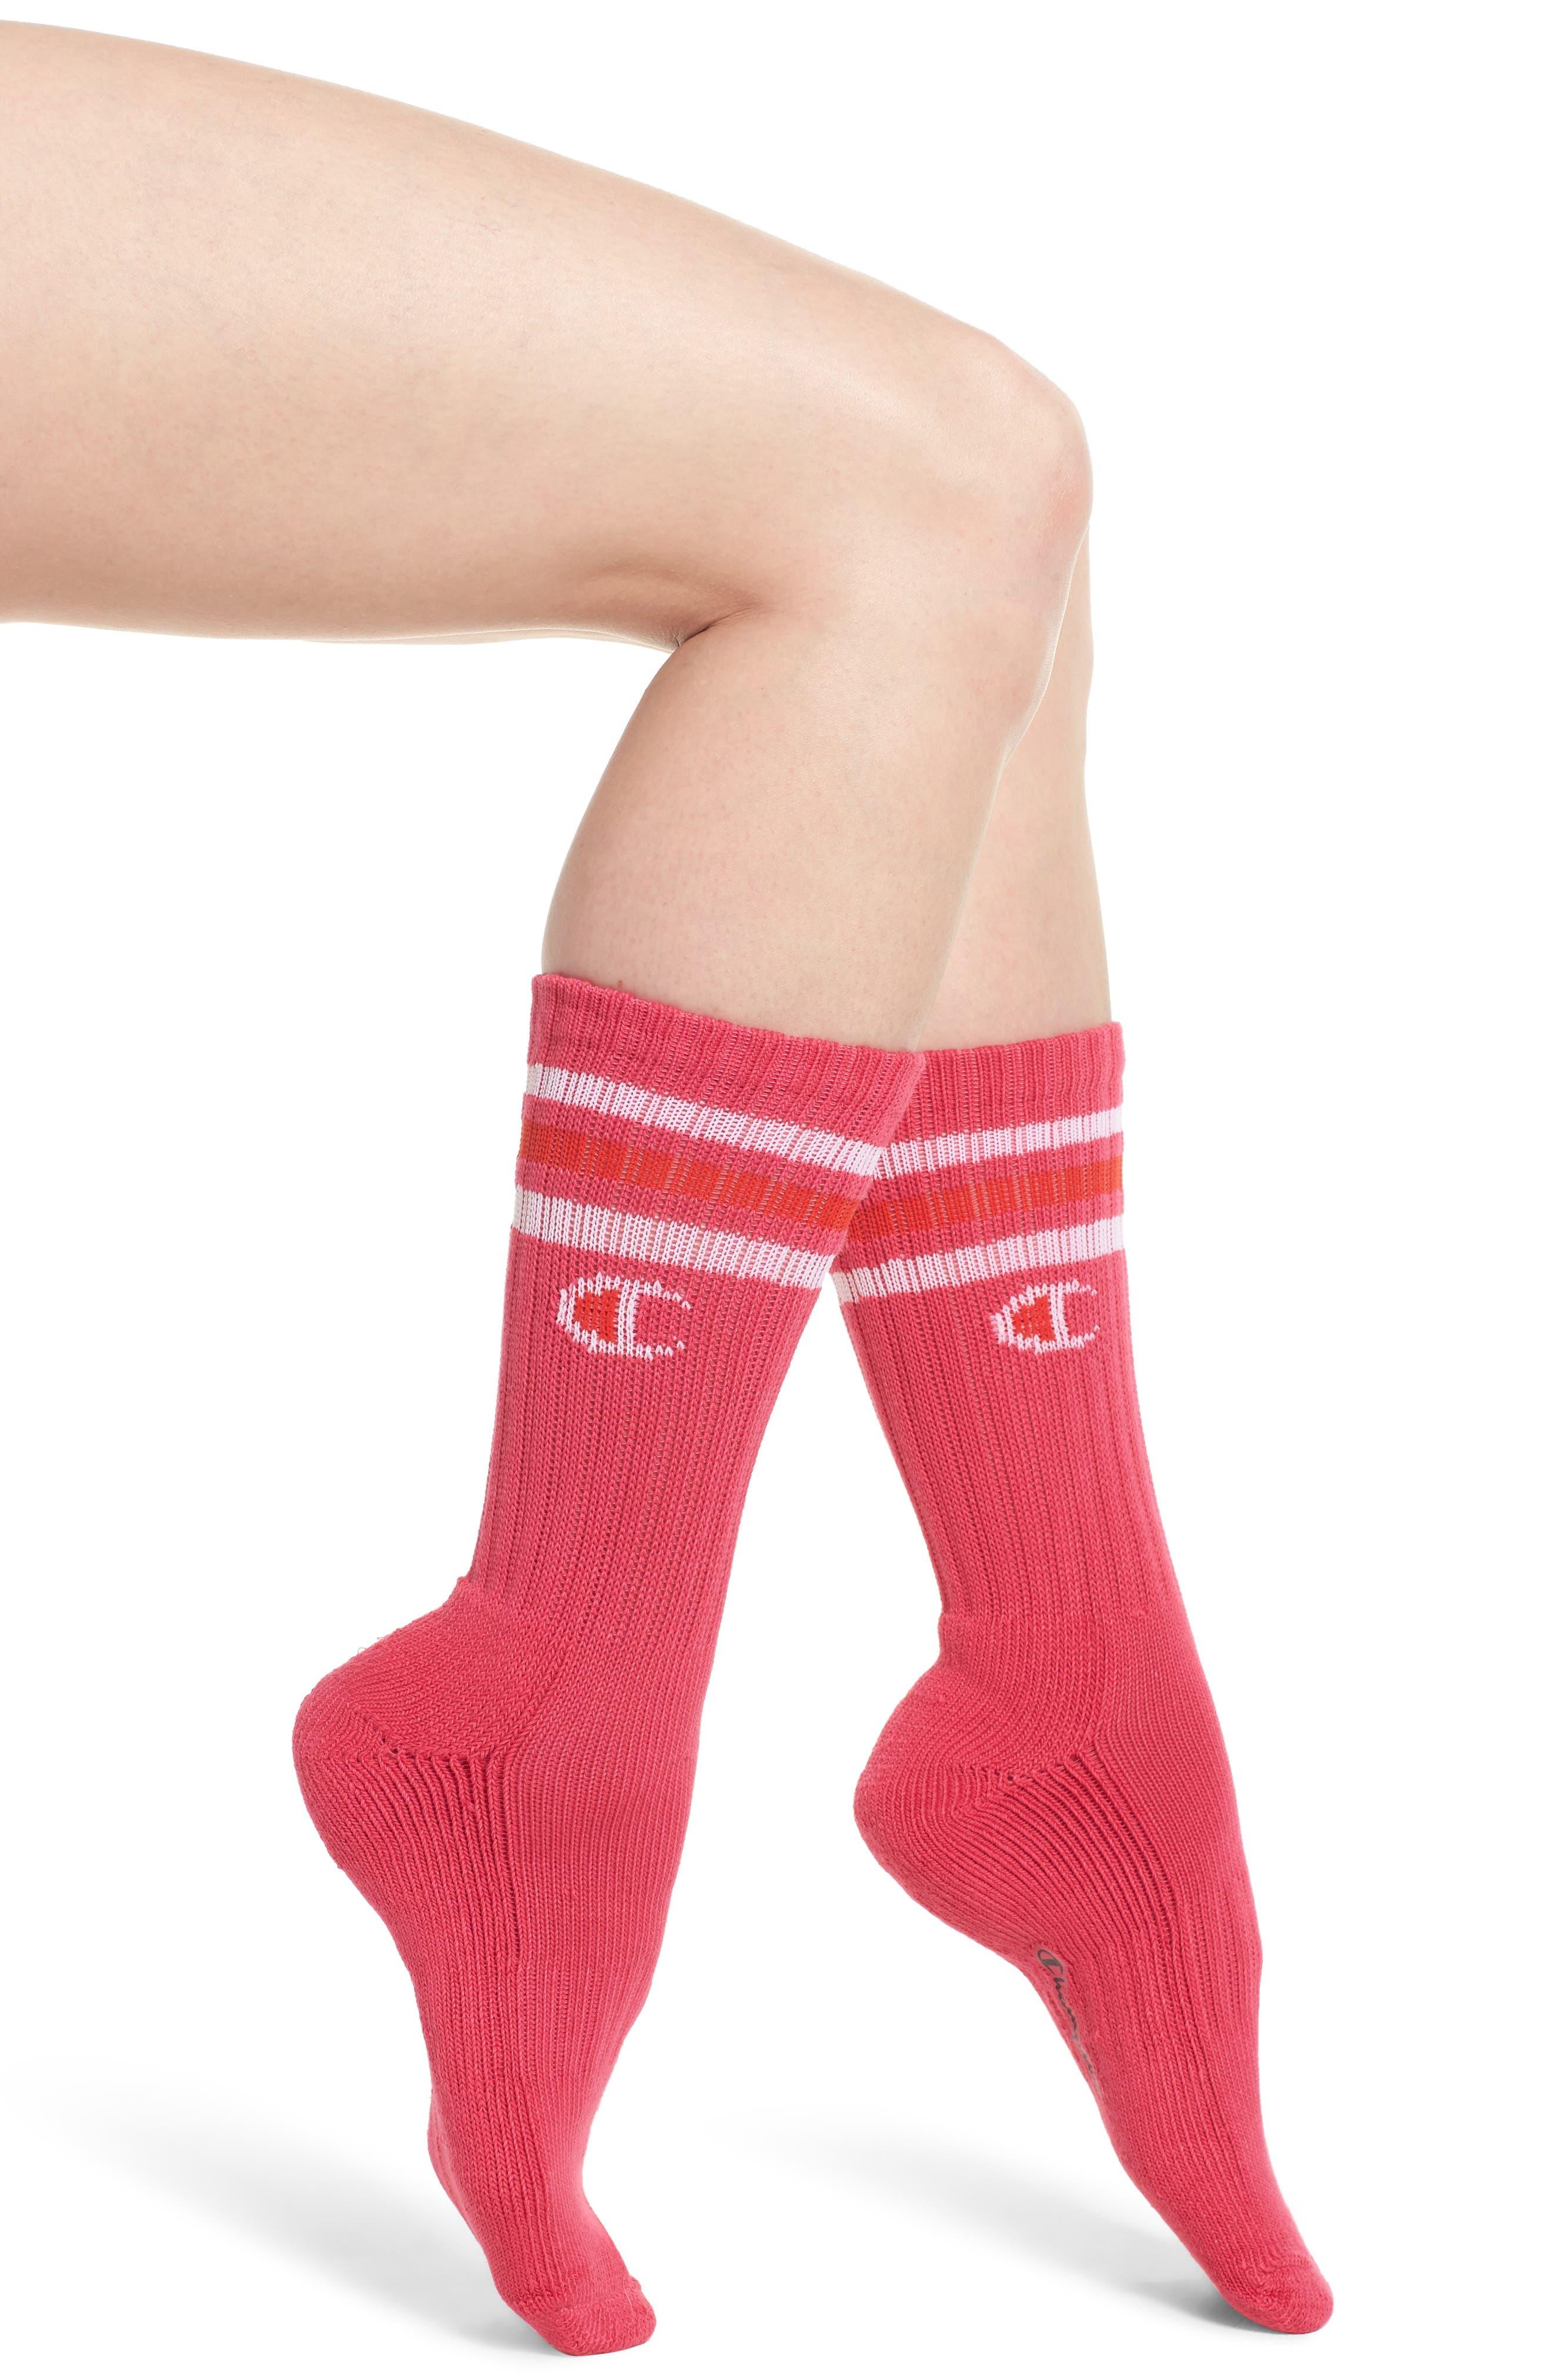 Big C Crew Socks,                         Main,                         color, Pink